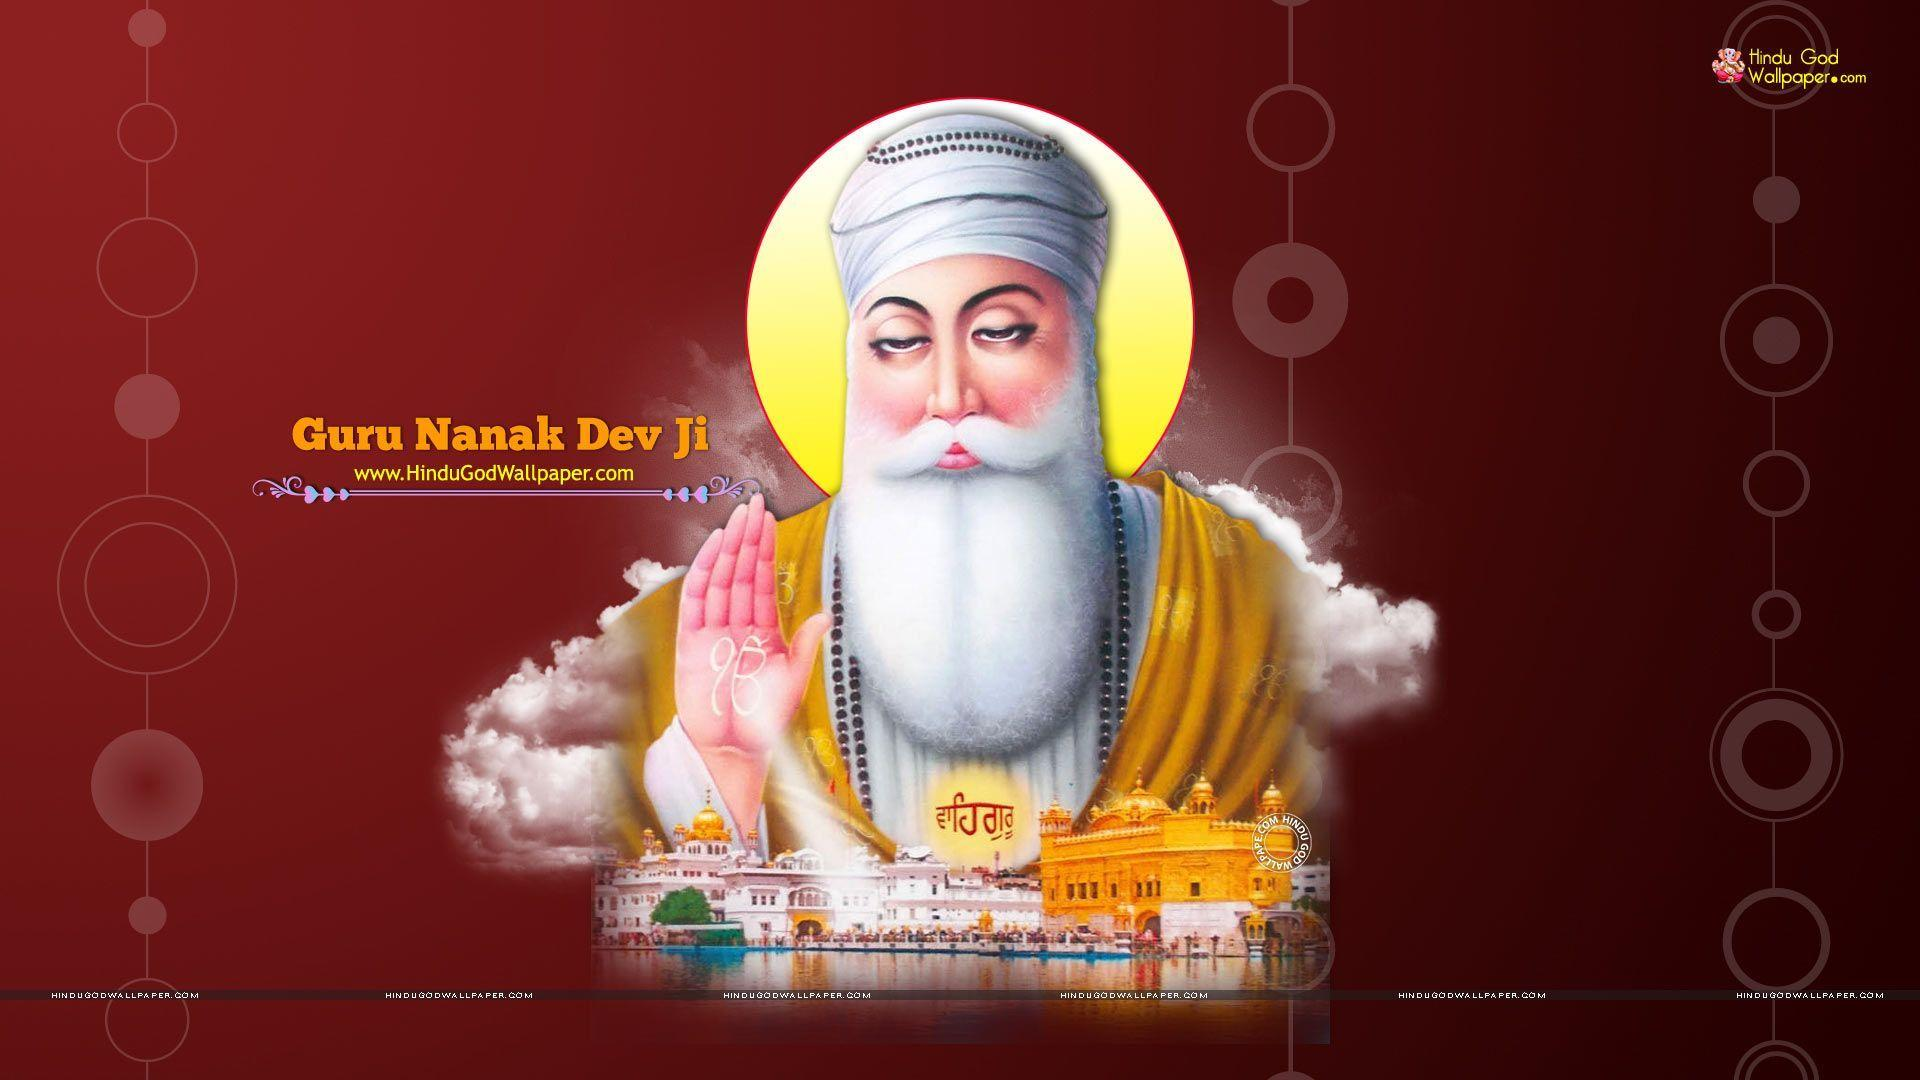 Sikh guru wallpapers hd wallpaper cave - Guru nanak dev ji pics hd ...